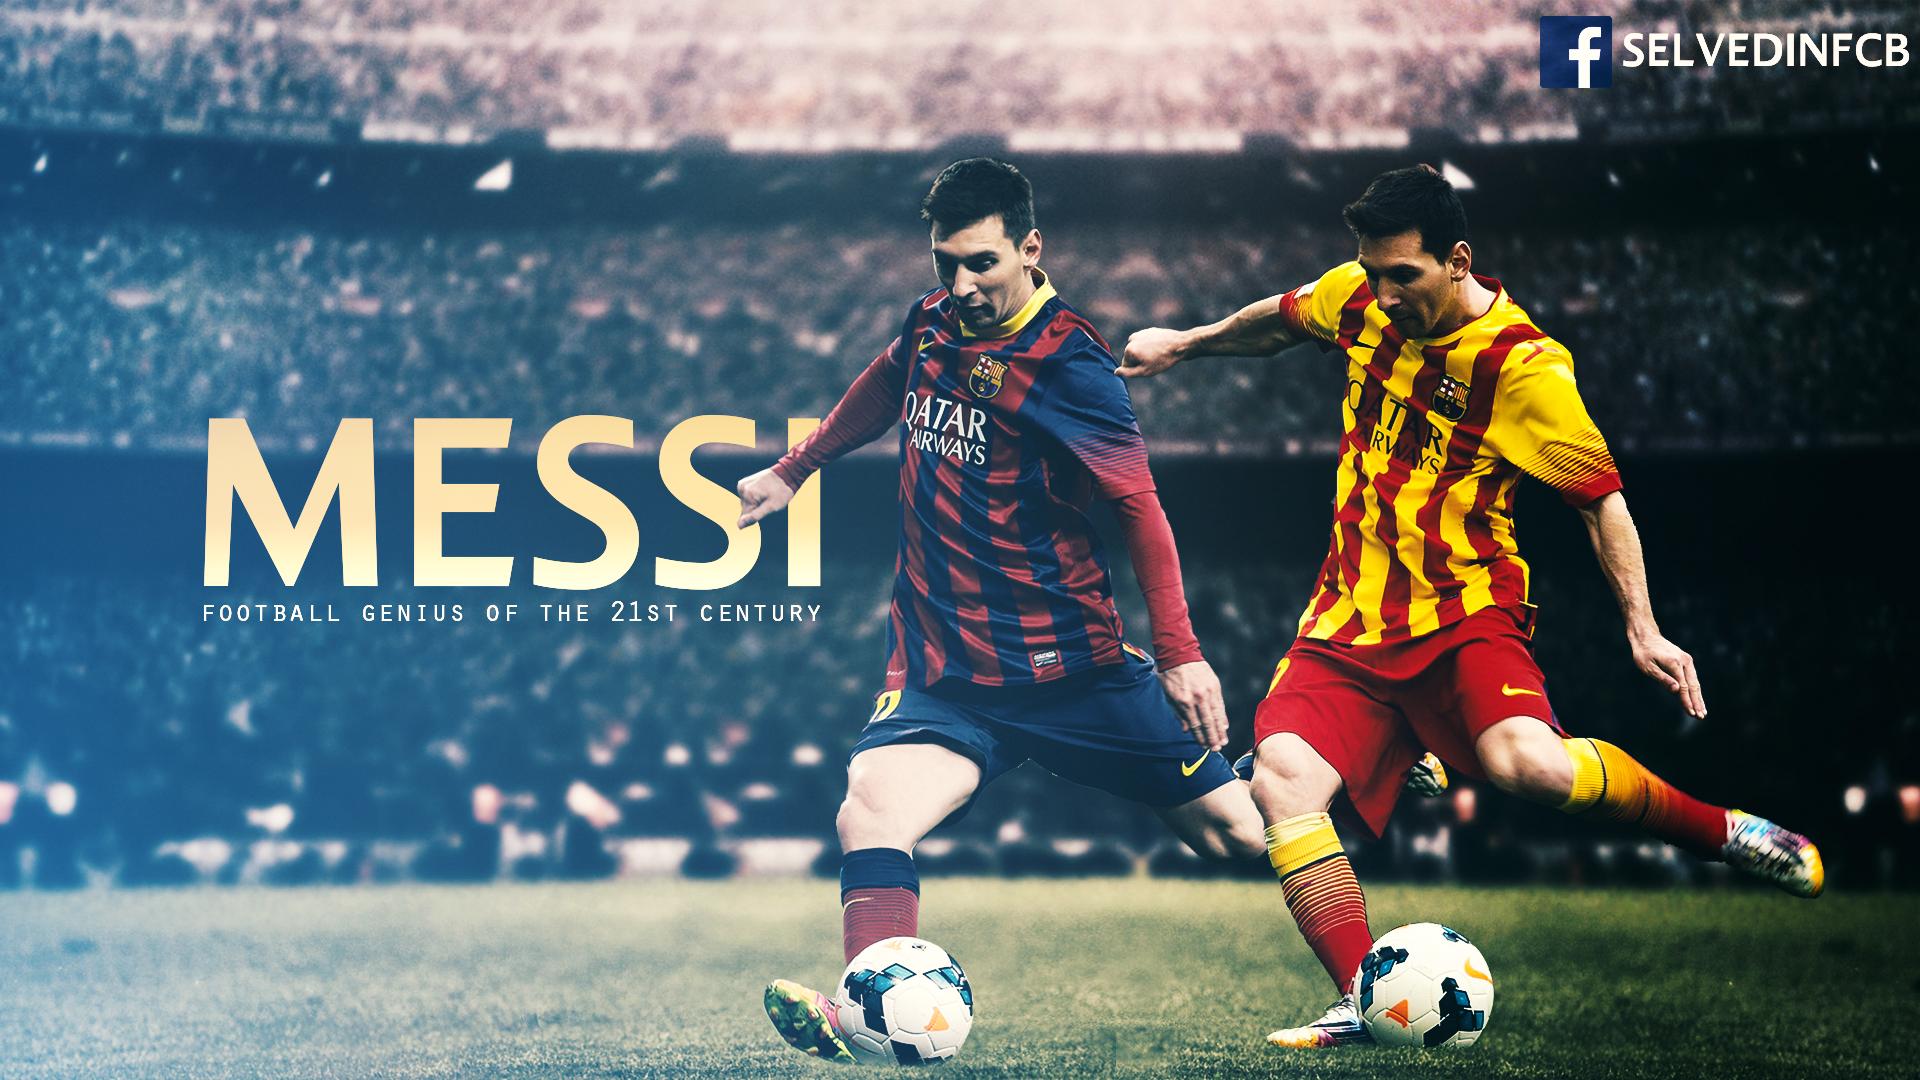 Lionel Messi Wallpaper HD 2014 download Wallpaper 1920x1080